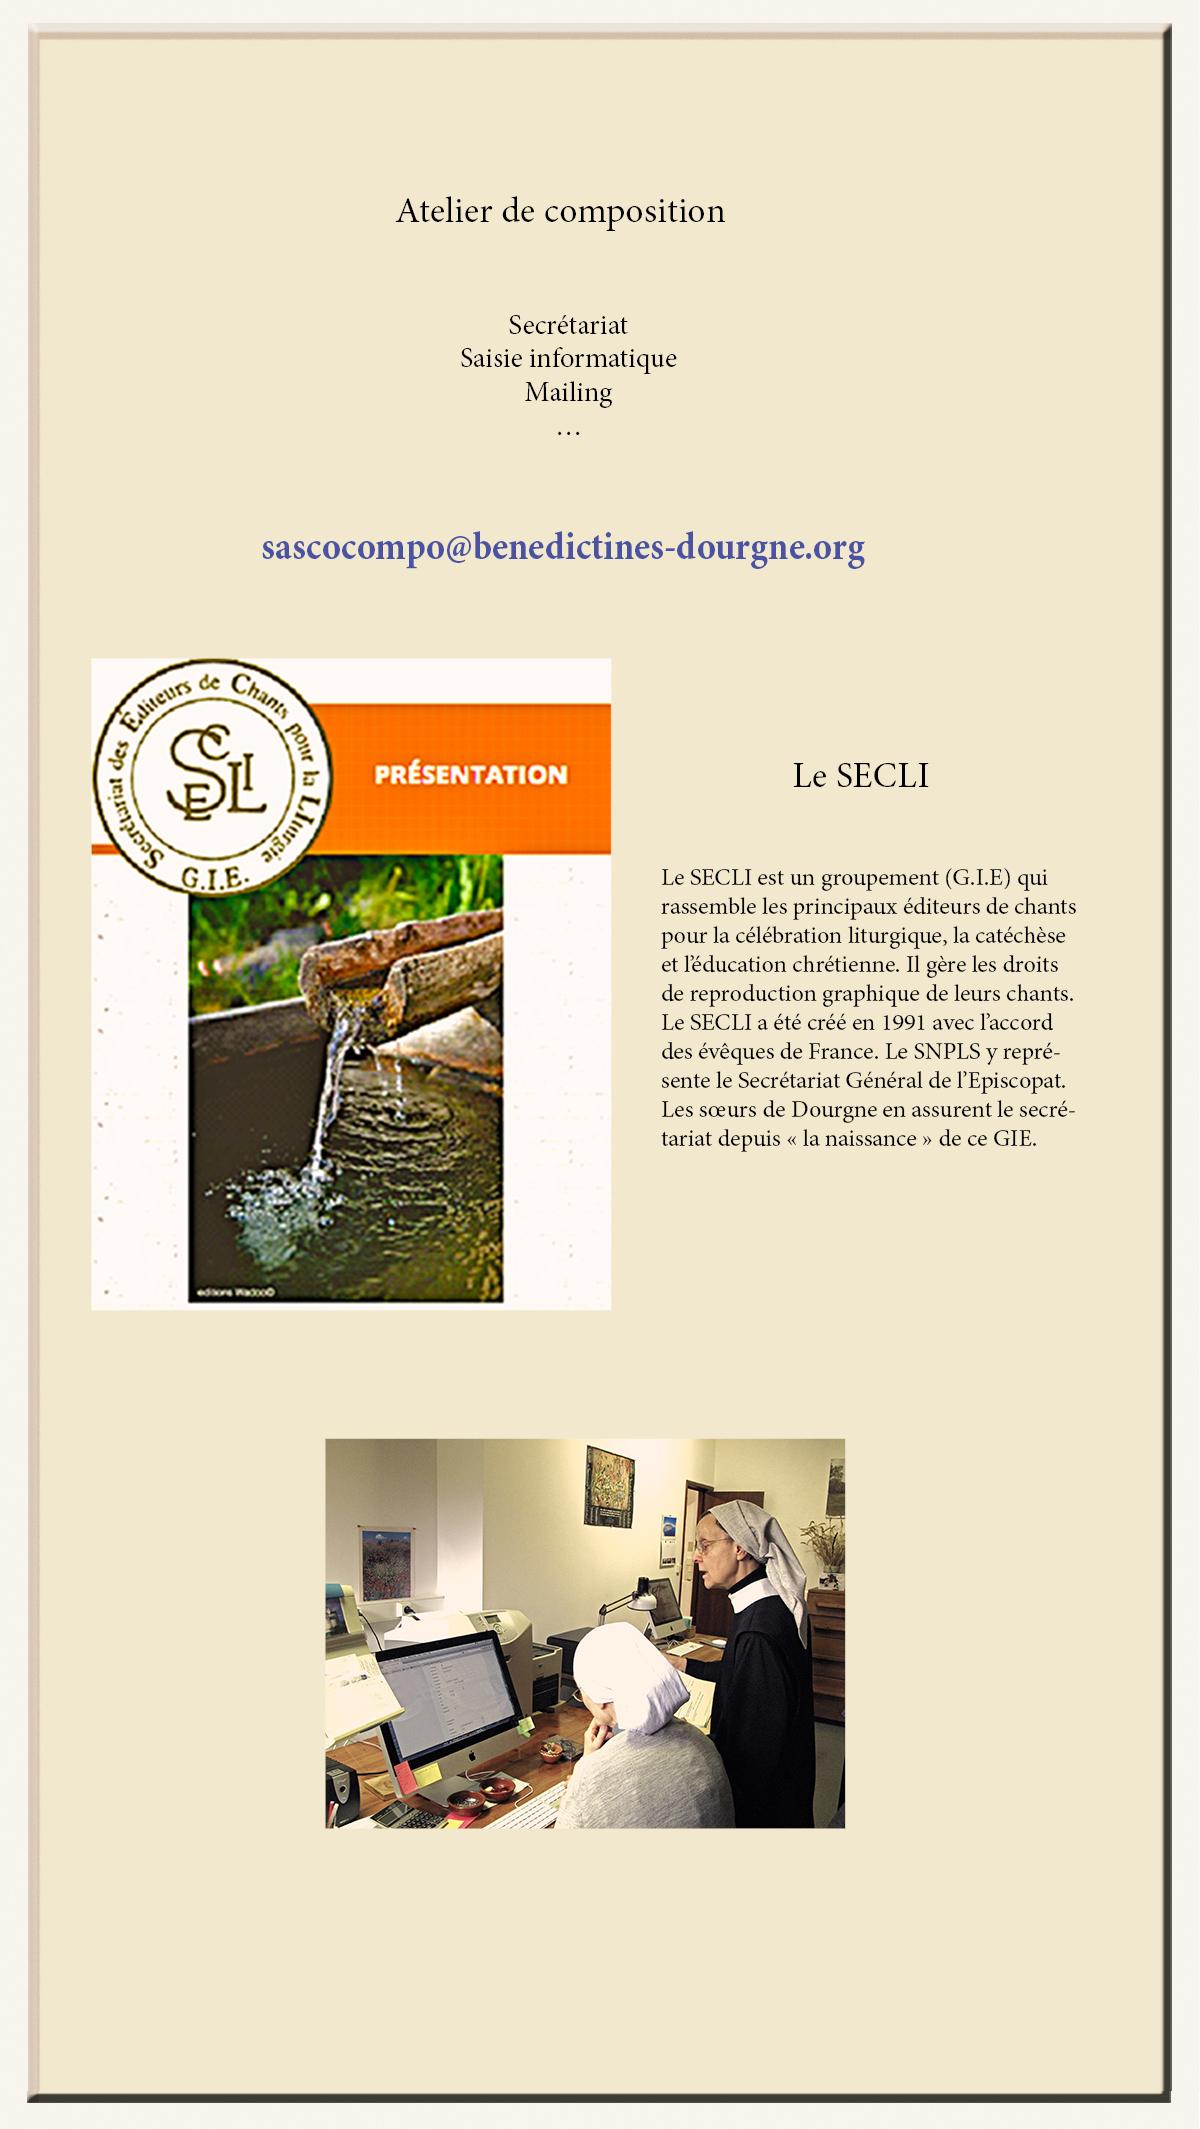 prestations_de_service_v3